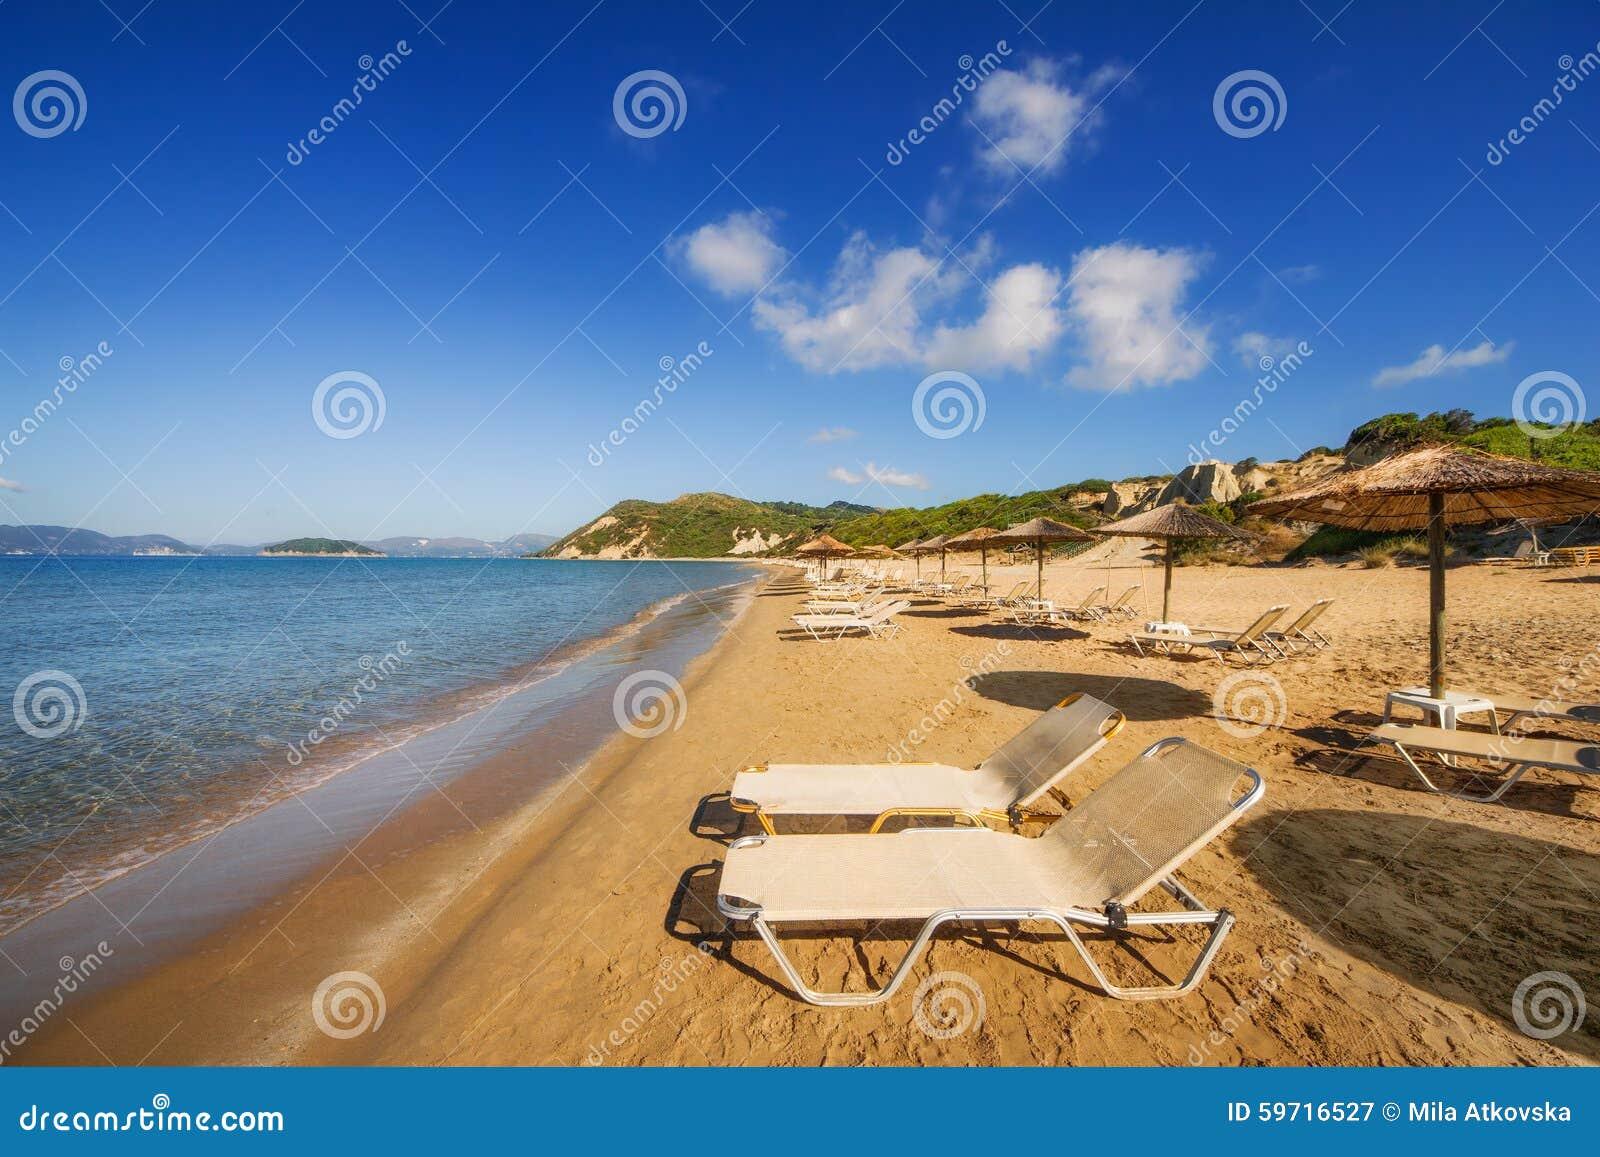 Gerakas-Strand (geschützter Caretta Carettaschildkröten-Nistplatz) auf Zakynthos-Insel